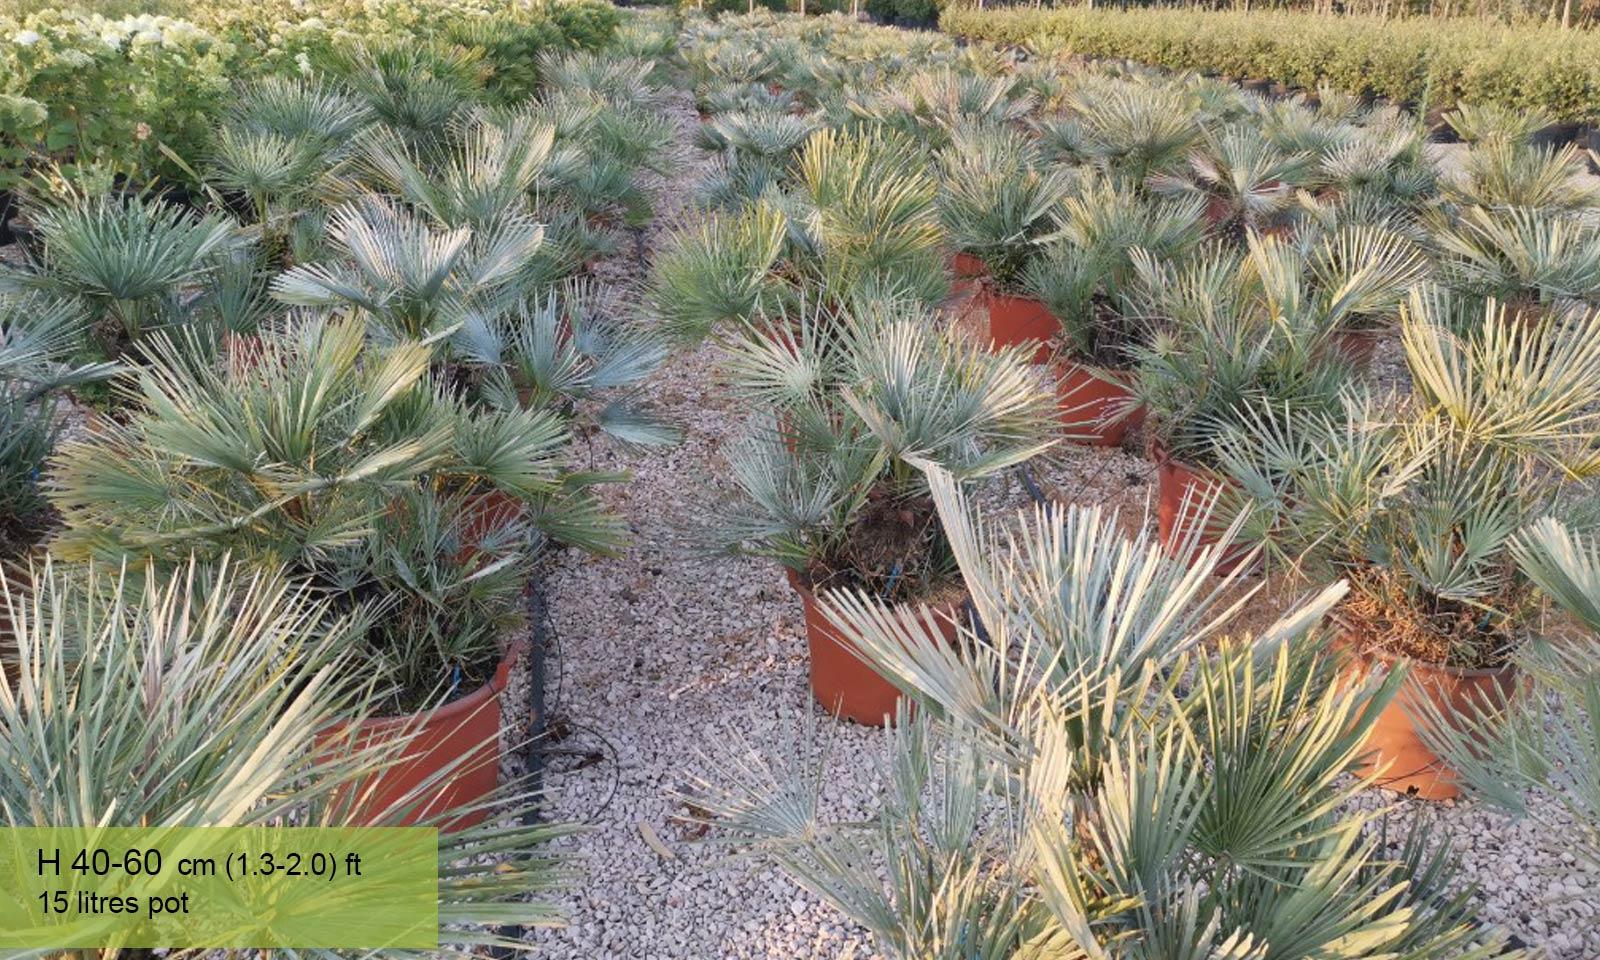 Chamaerops Humilis Cerifera (Blue Leaves) - Garden Plants Online